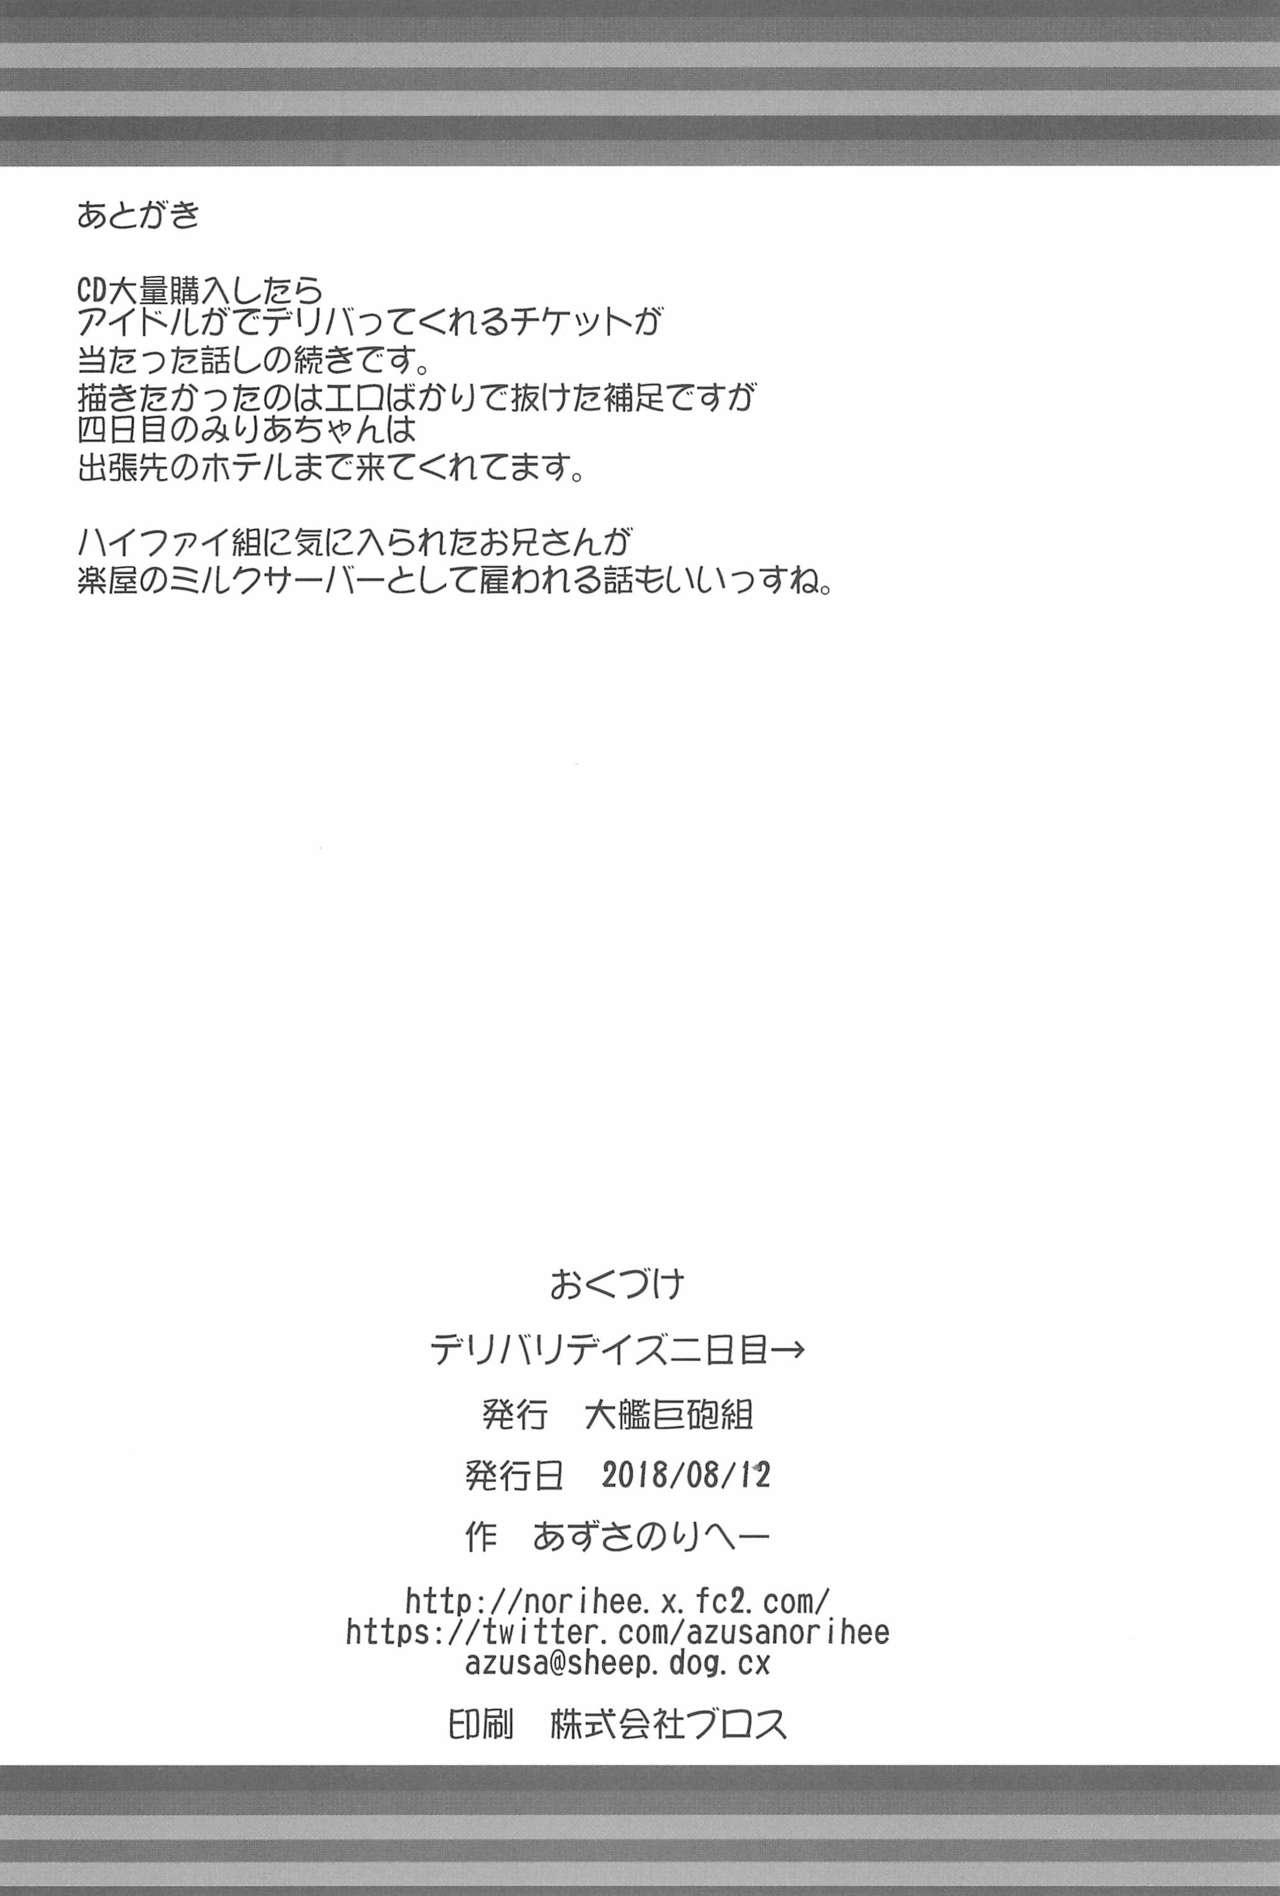 Delivery Days Futsukame→ 25